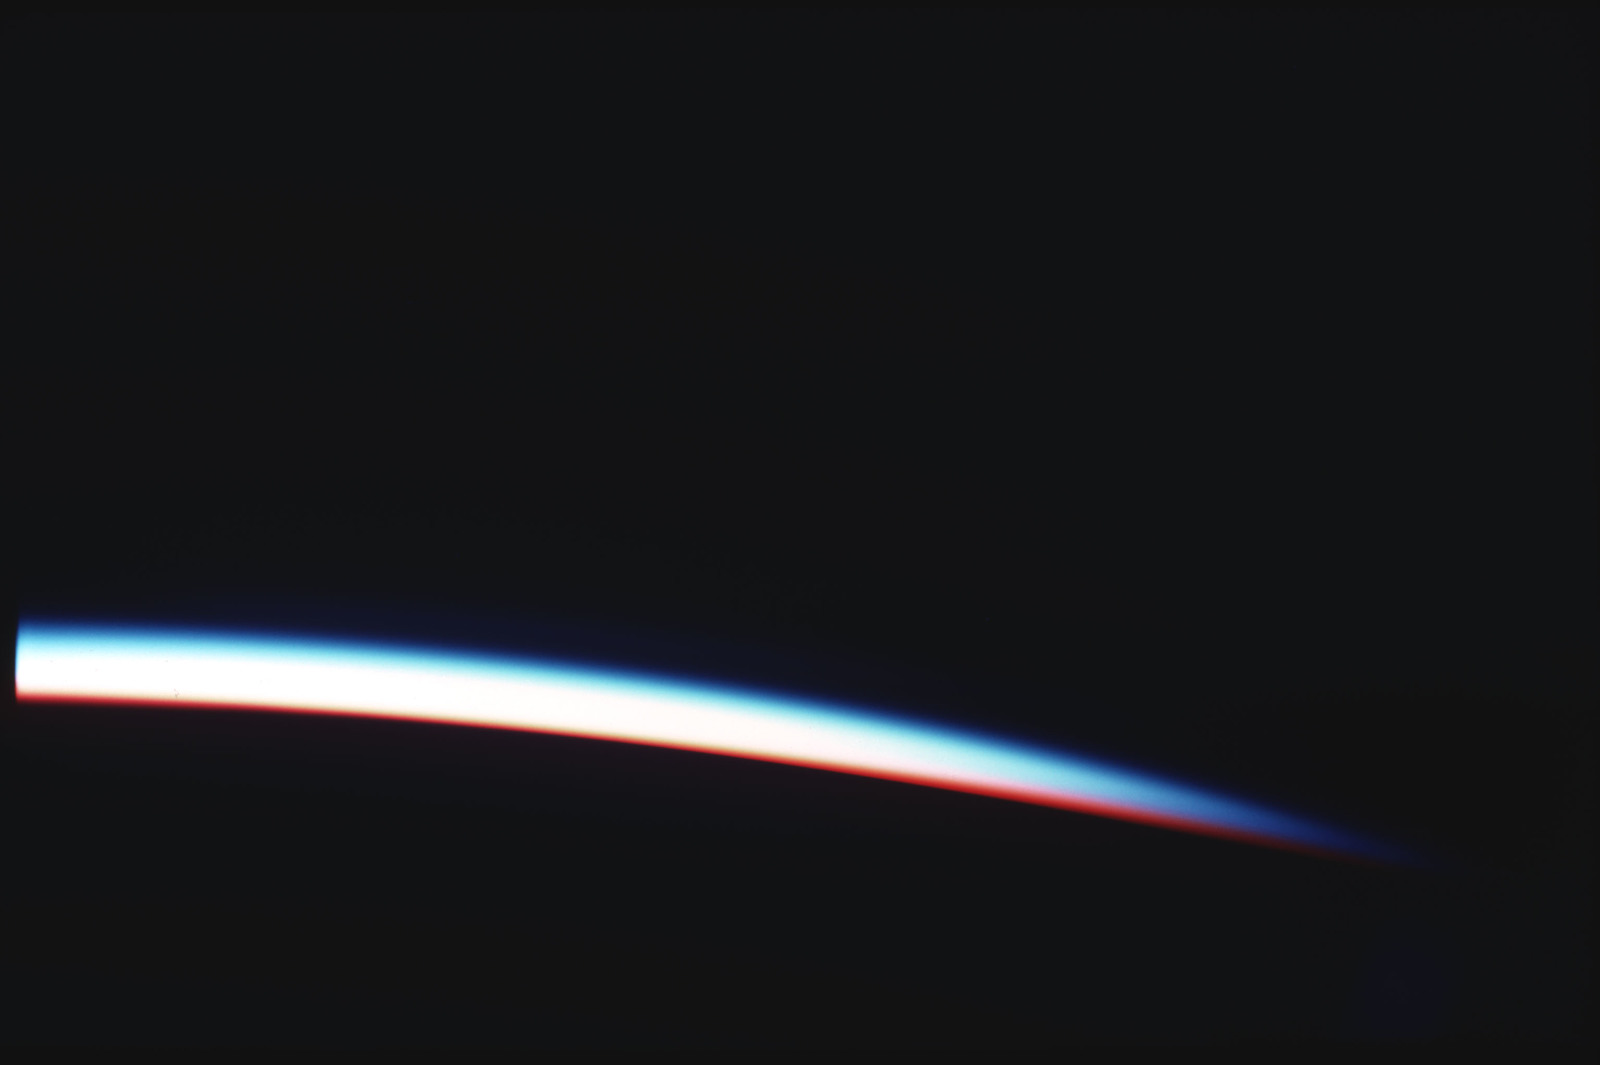 S03-31-296 - STS-003 - Earth limb terminator at sunrise